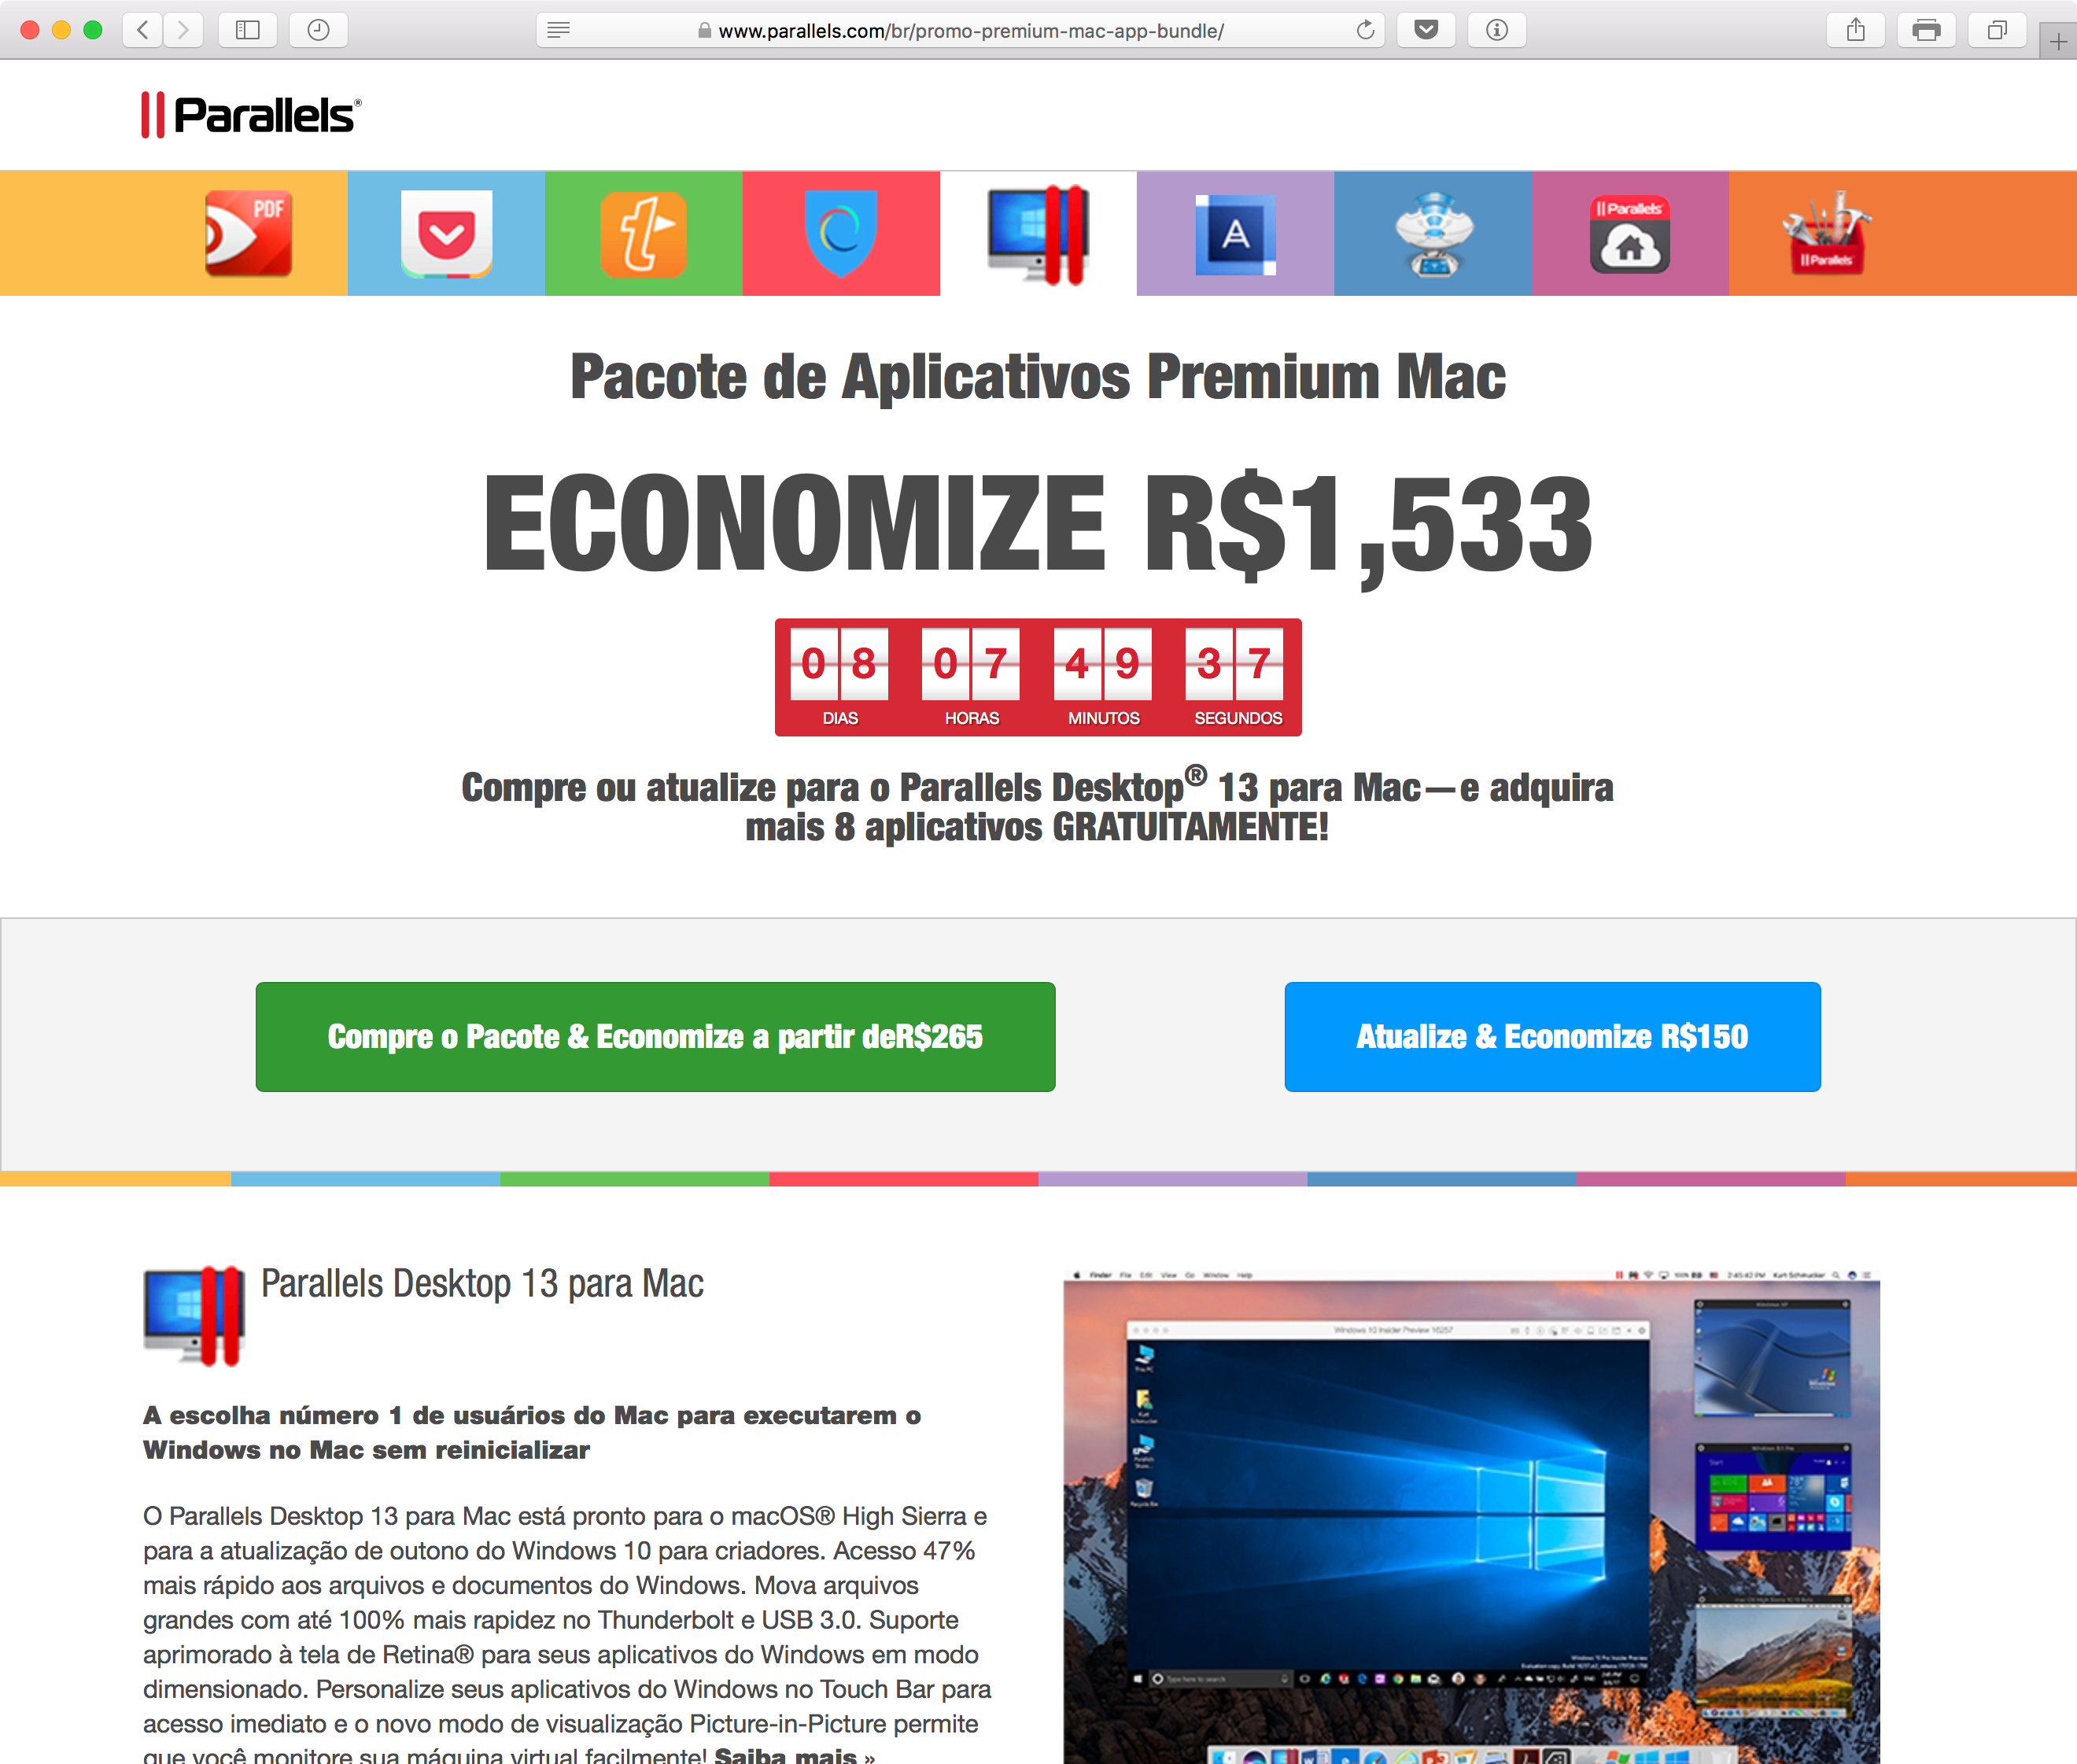 Parallels - Pacote de Aplicativos Premium Mac